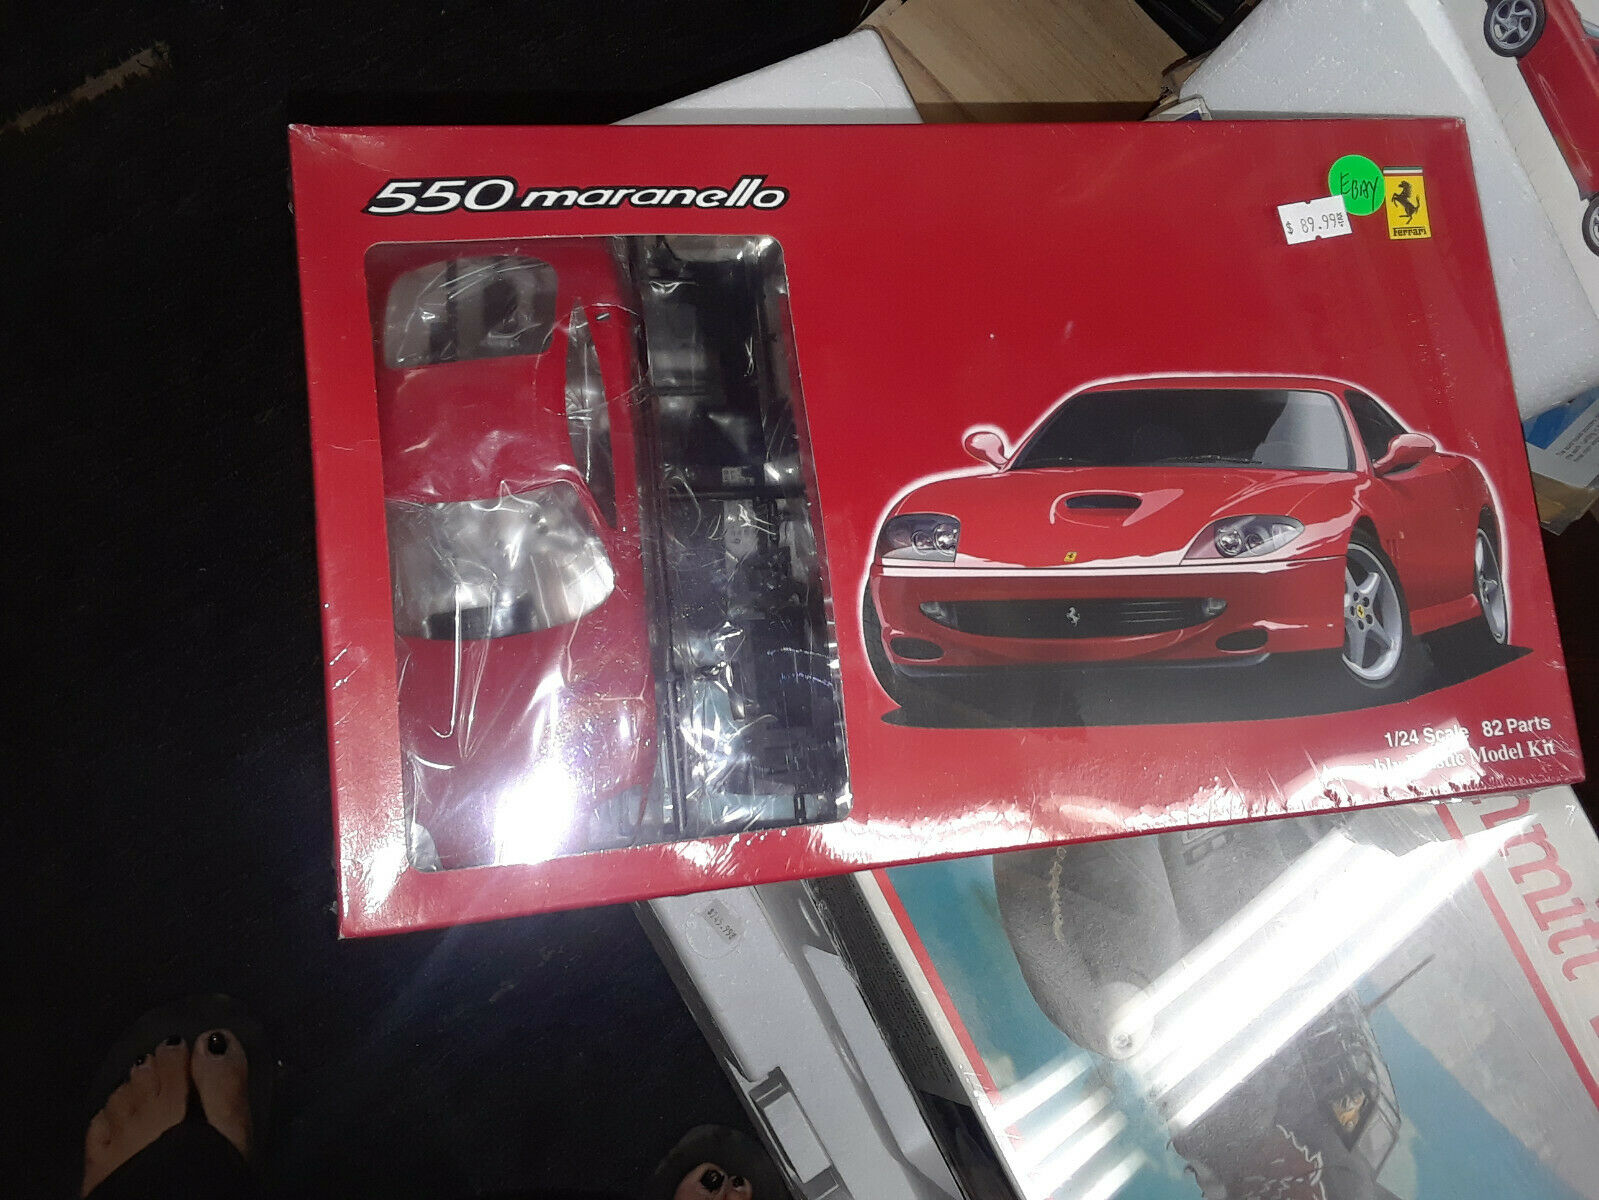 Ferrari 550 Maranello model kit 1 24 scale